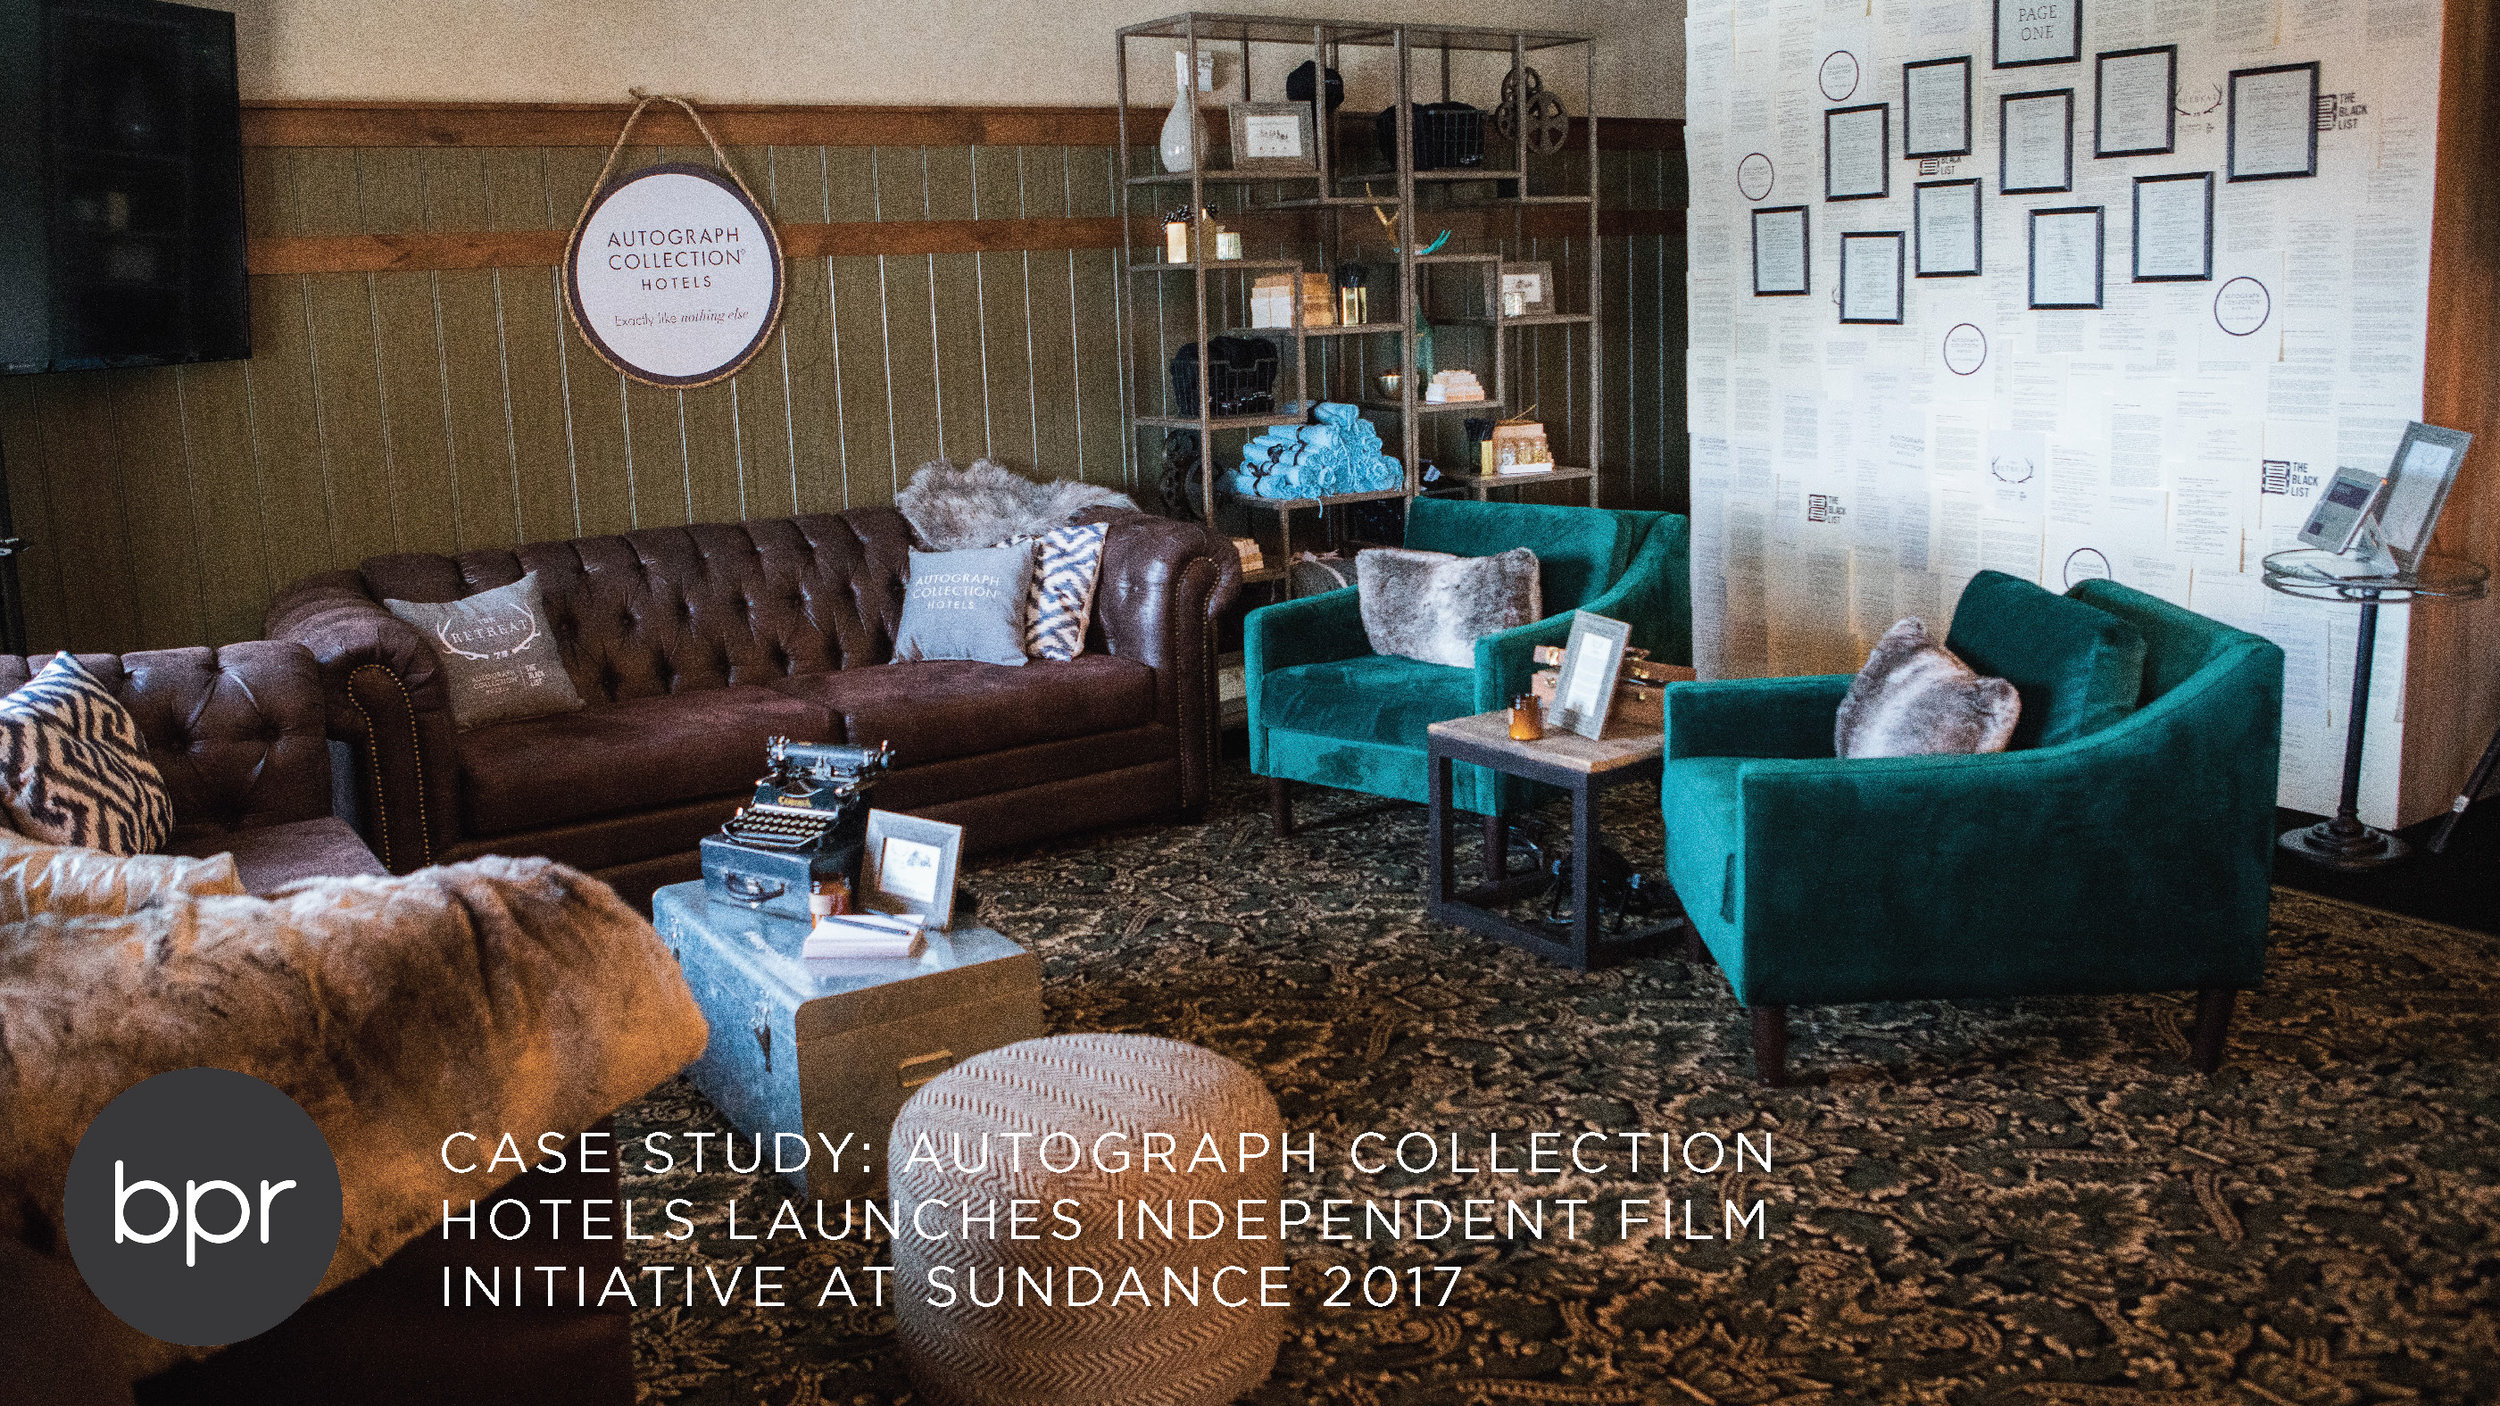 Autograph Sundance Case Study_Page_1.jpg